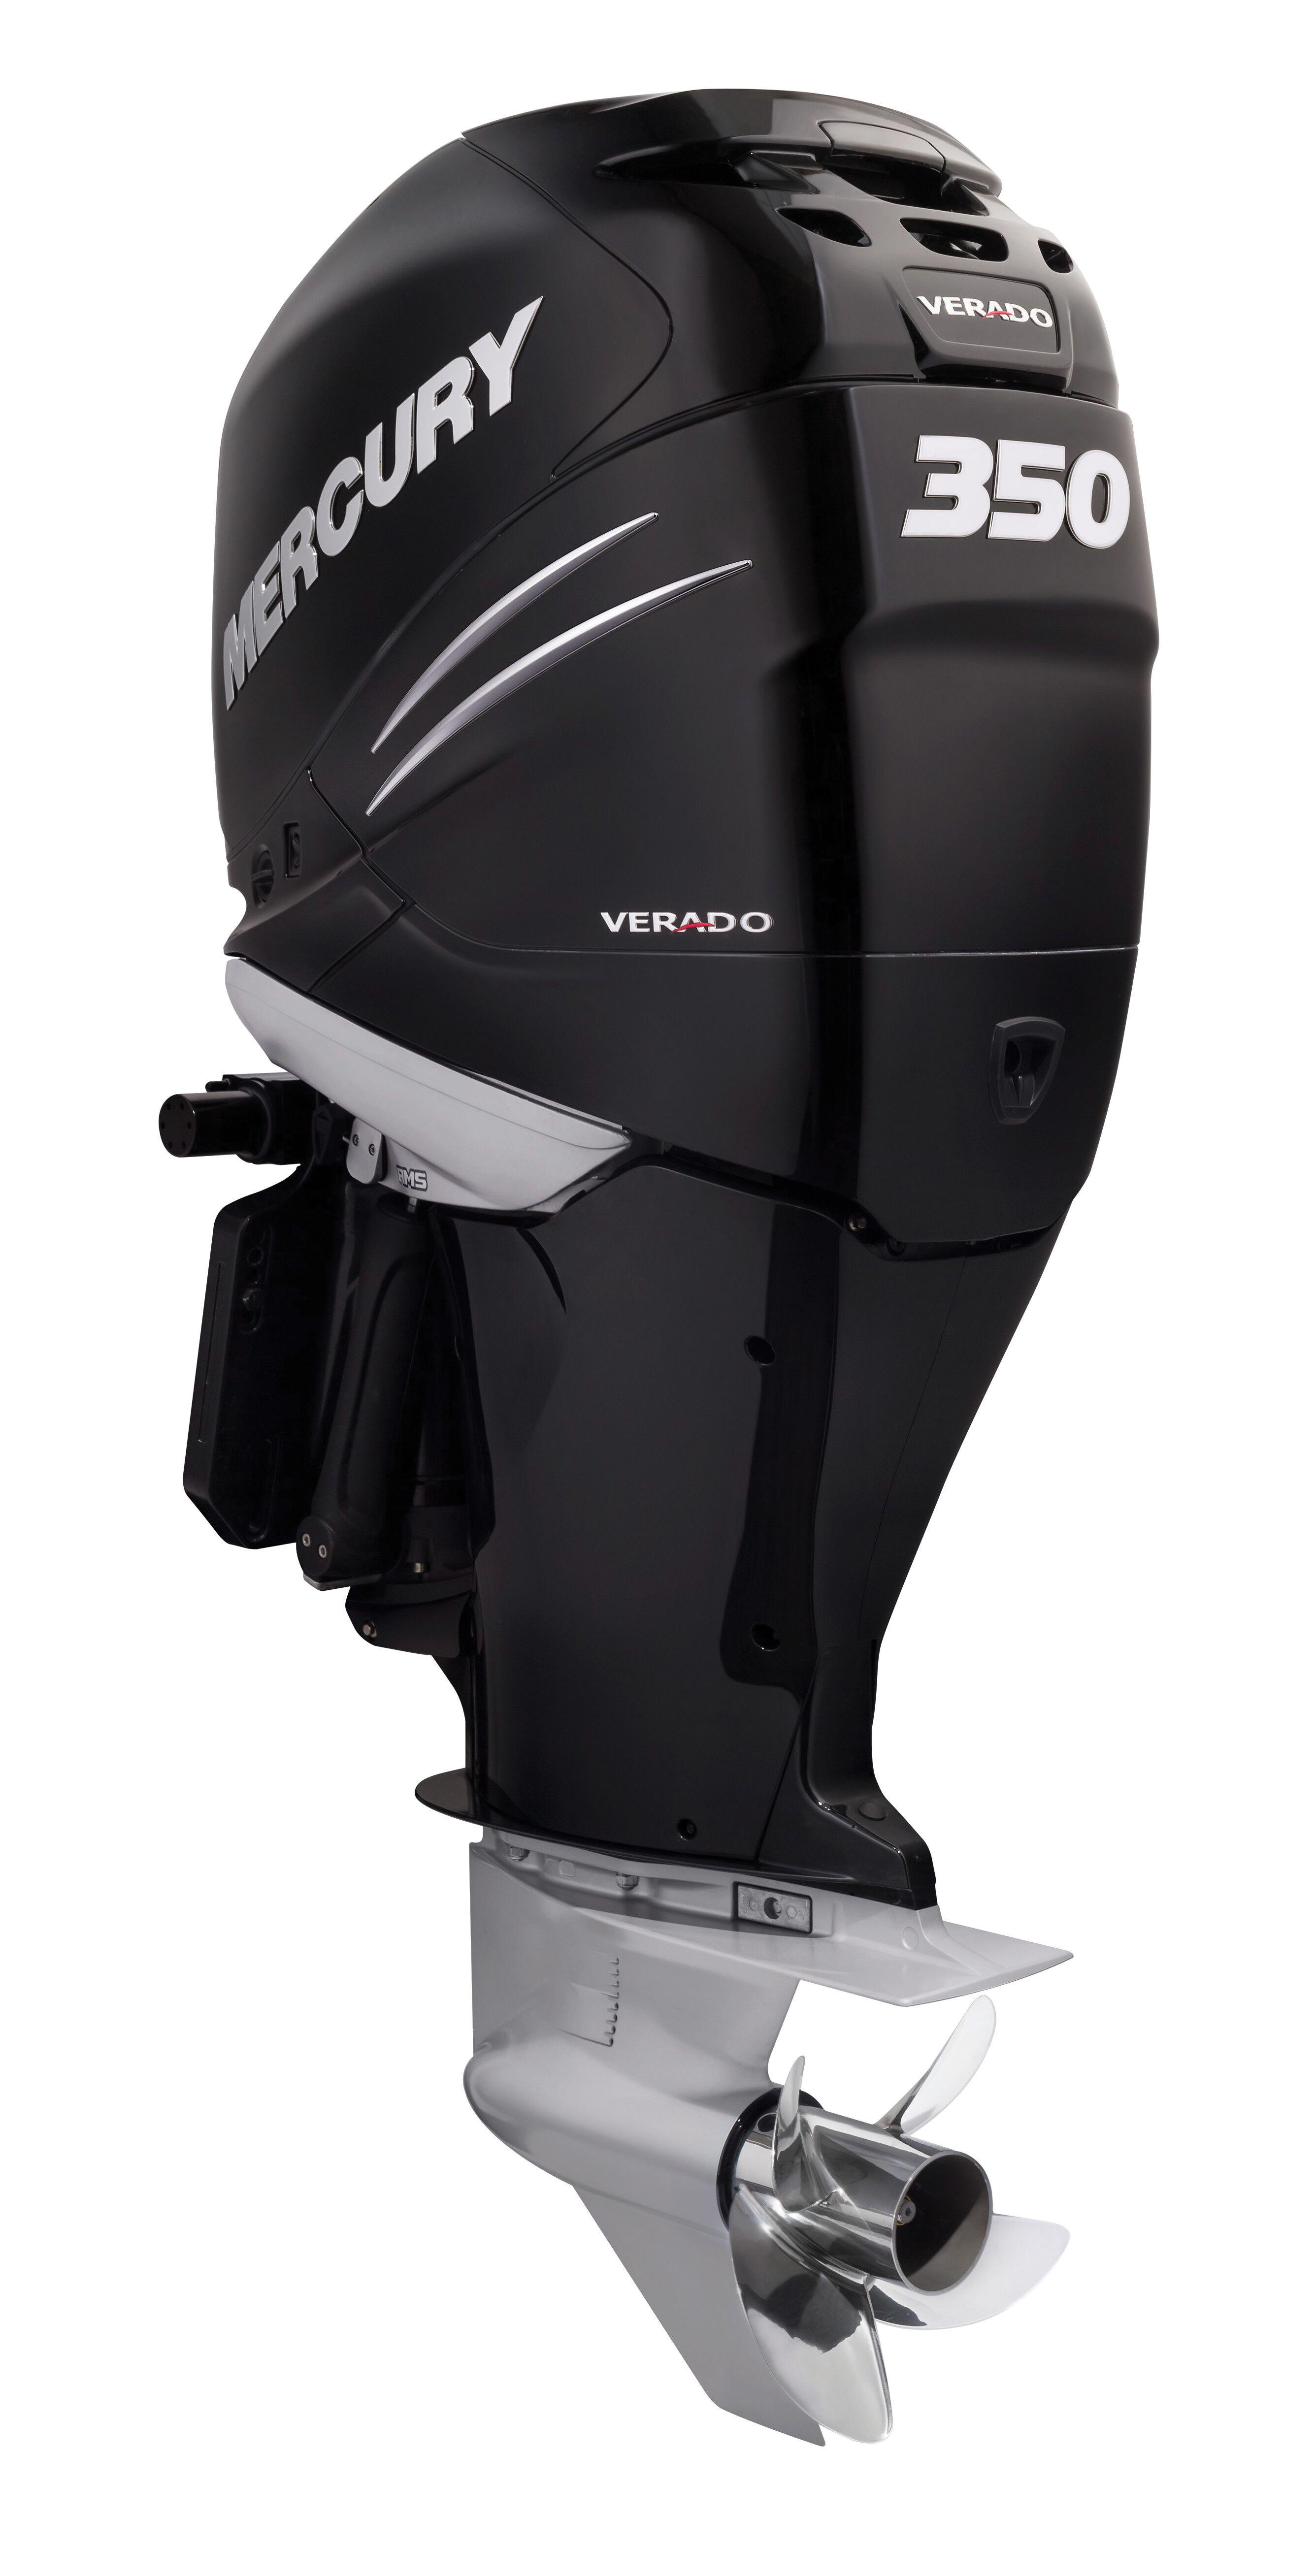 2018 1 Buyers Guide Merc 350HP Verado Black Preview